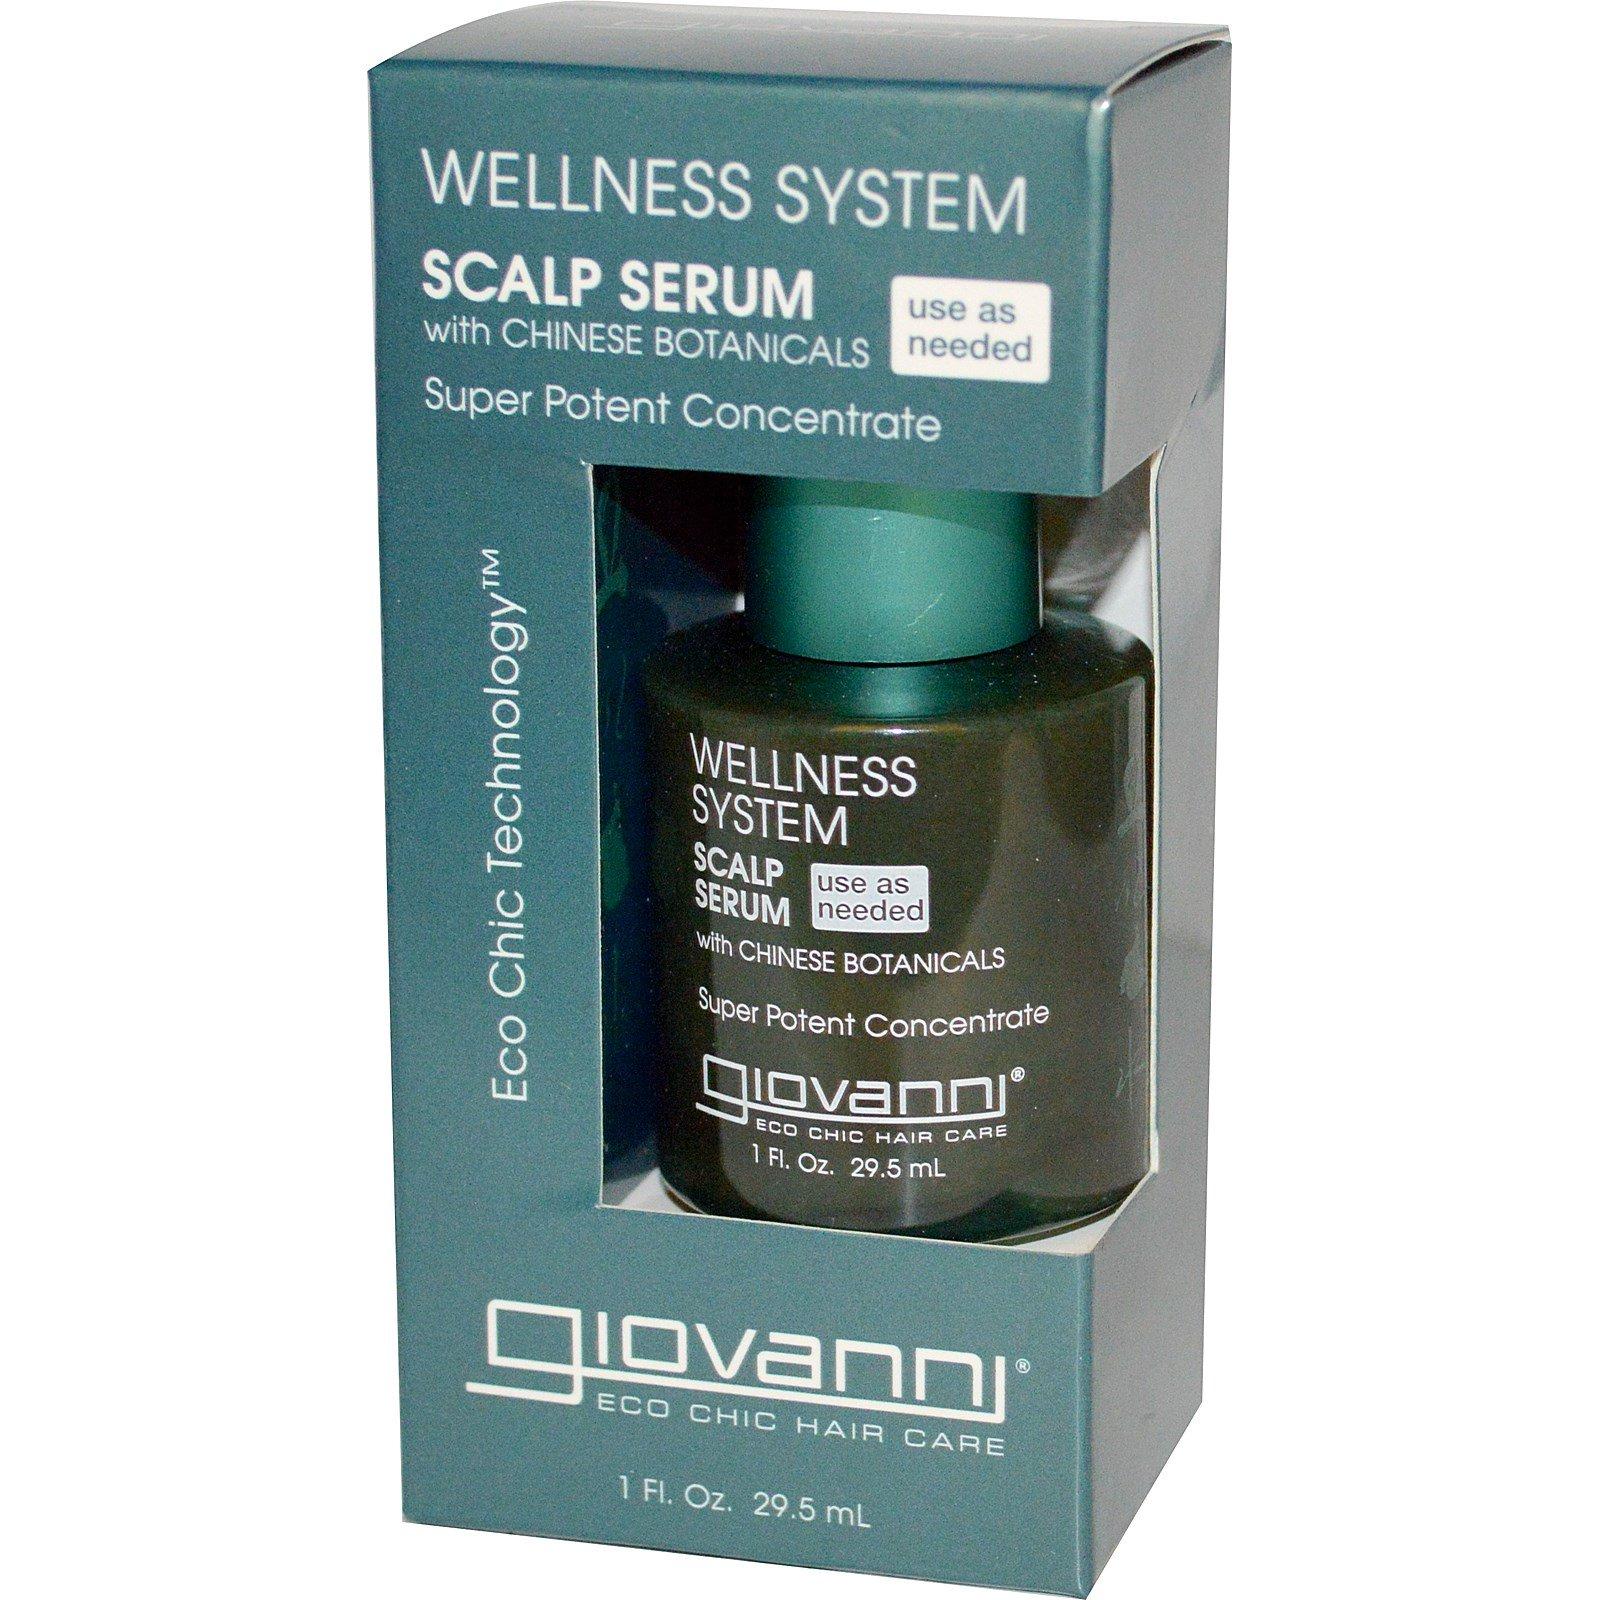 Giovanni, Wellness System Scalp Serum, 1 oz.